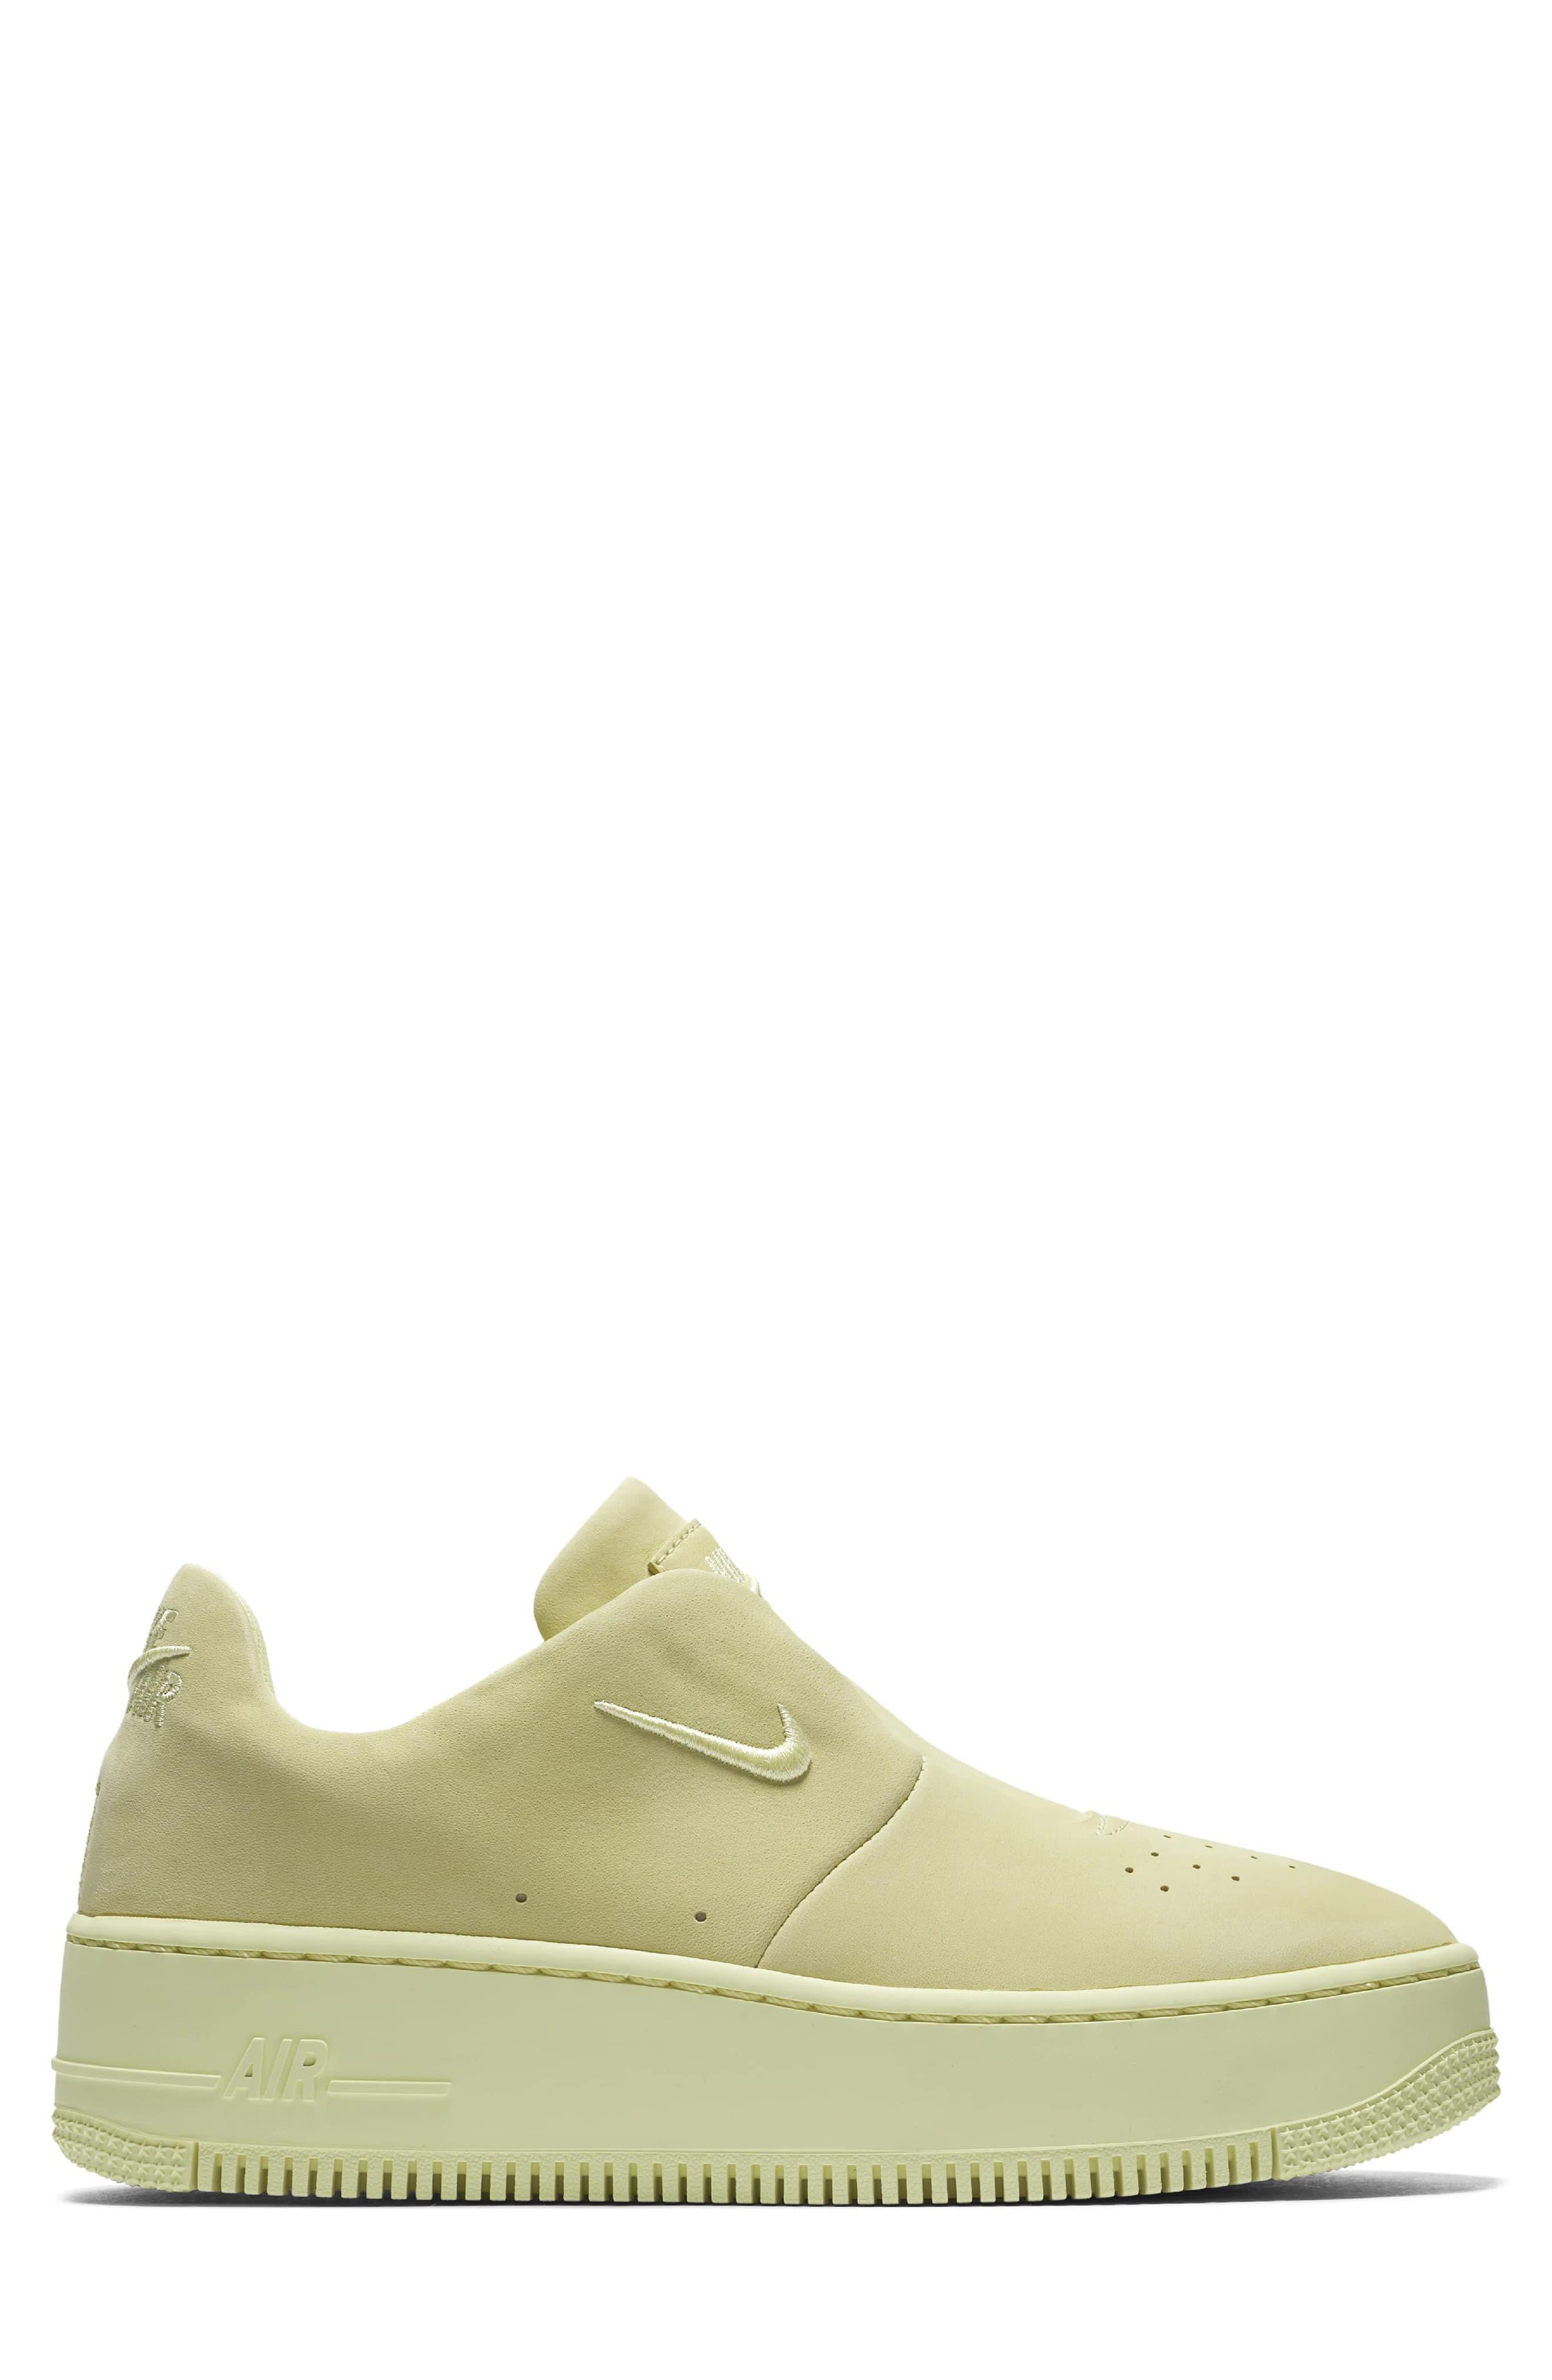 Air Force 1 Sage XX Sneaker,                             Alternate thumbnail 3, color,                             Luminous Green